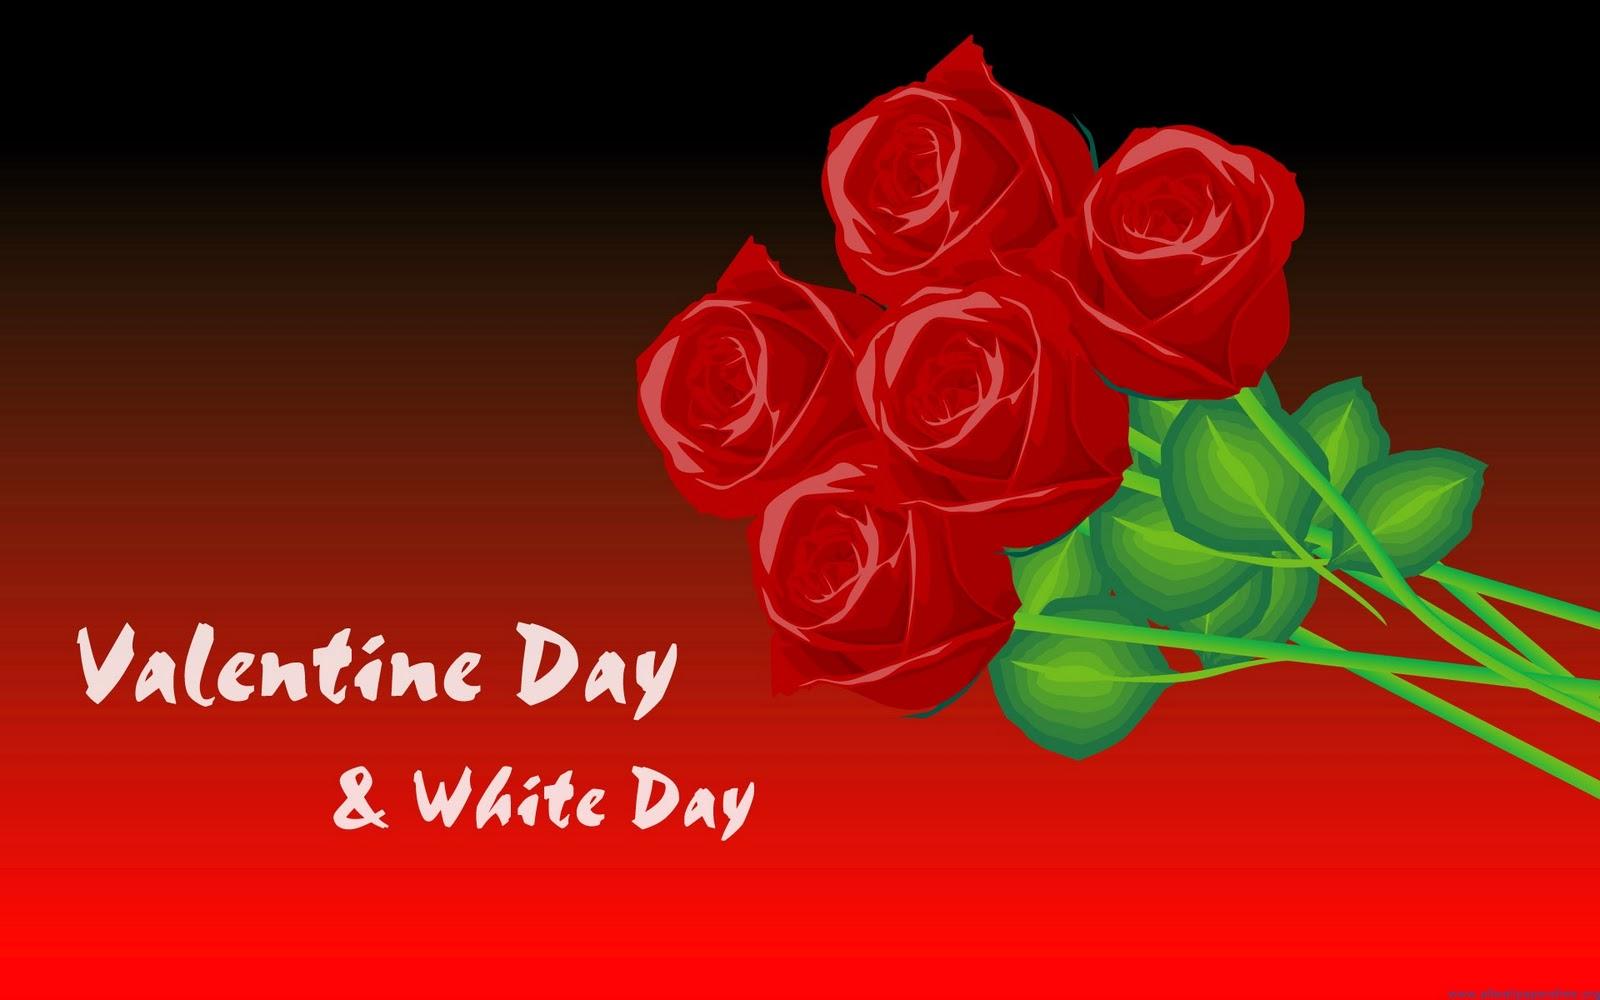 http://4.bp.blogspot.com/-drXAl7NOnHM/Tyo-CEpLqlI/AAAAAAAAB0k/pAFydwAOV38/s1600/Beautiful+Valentine%2527s+Day+HD+Widescreen+Wallpapers+%252855%2529.jpg